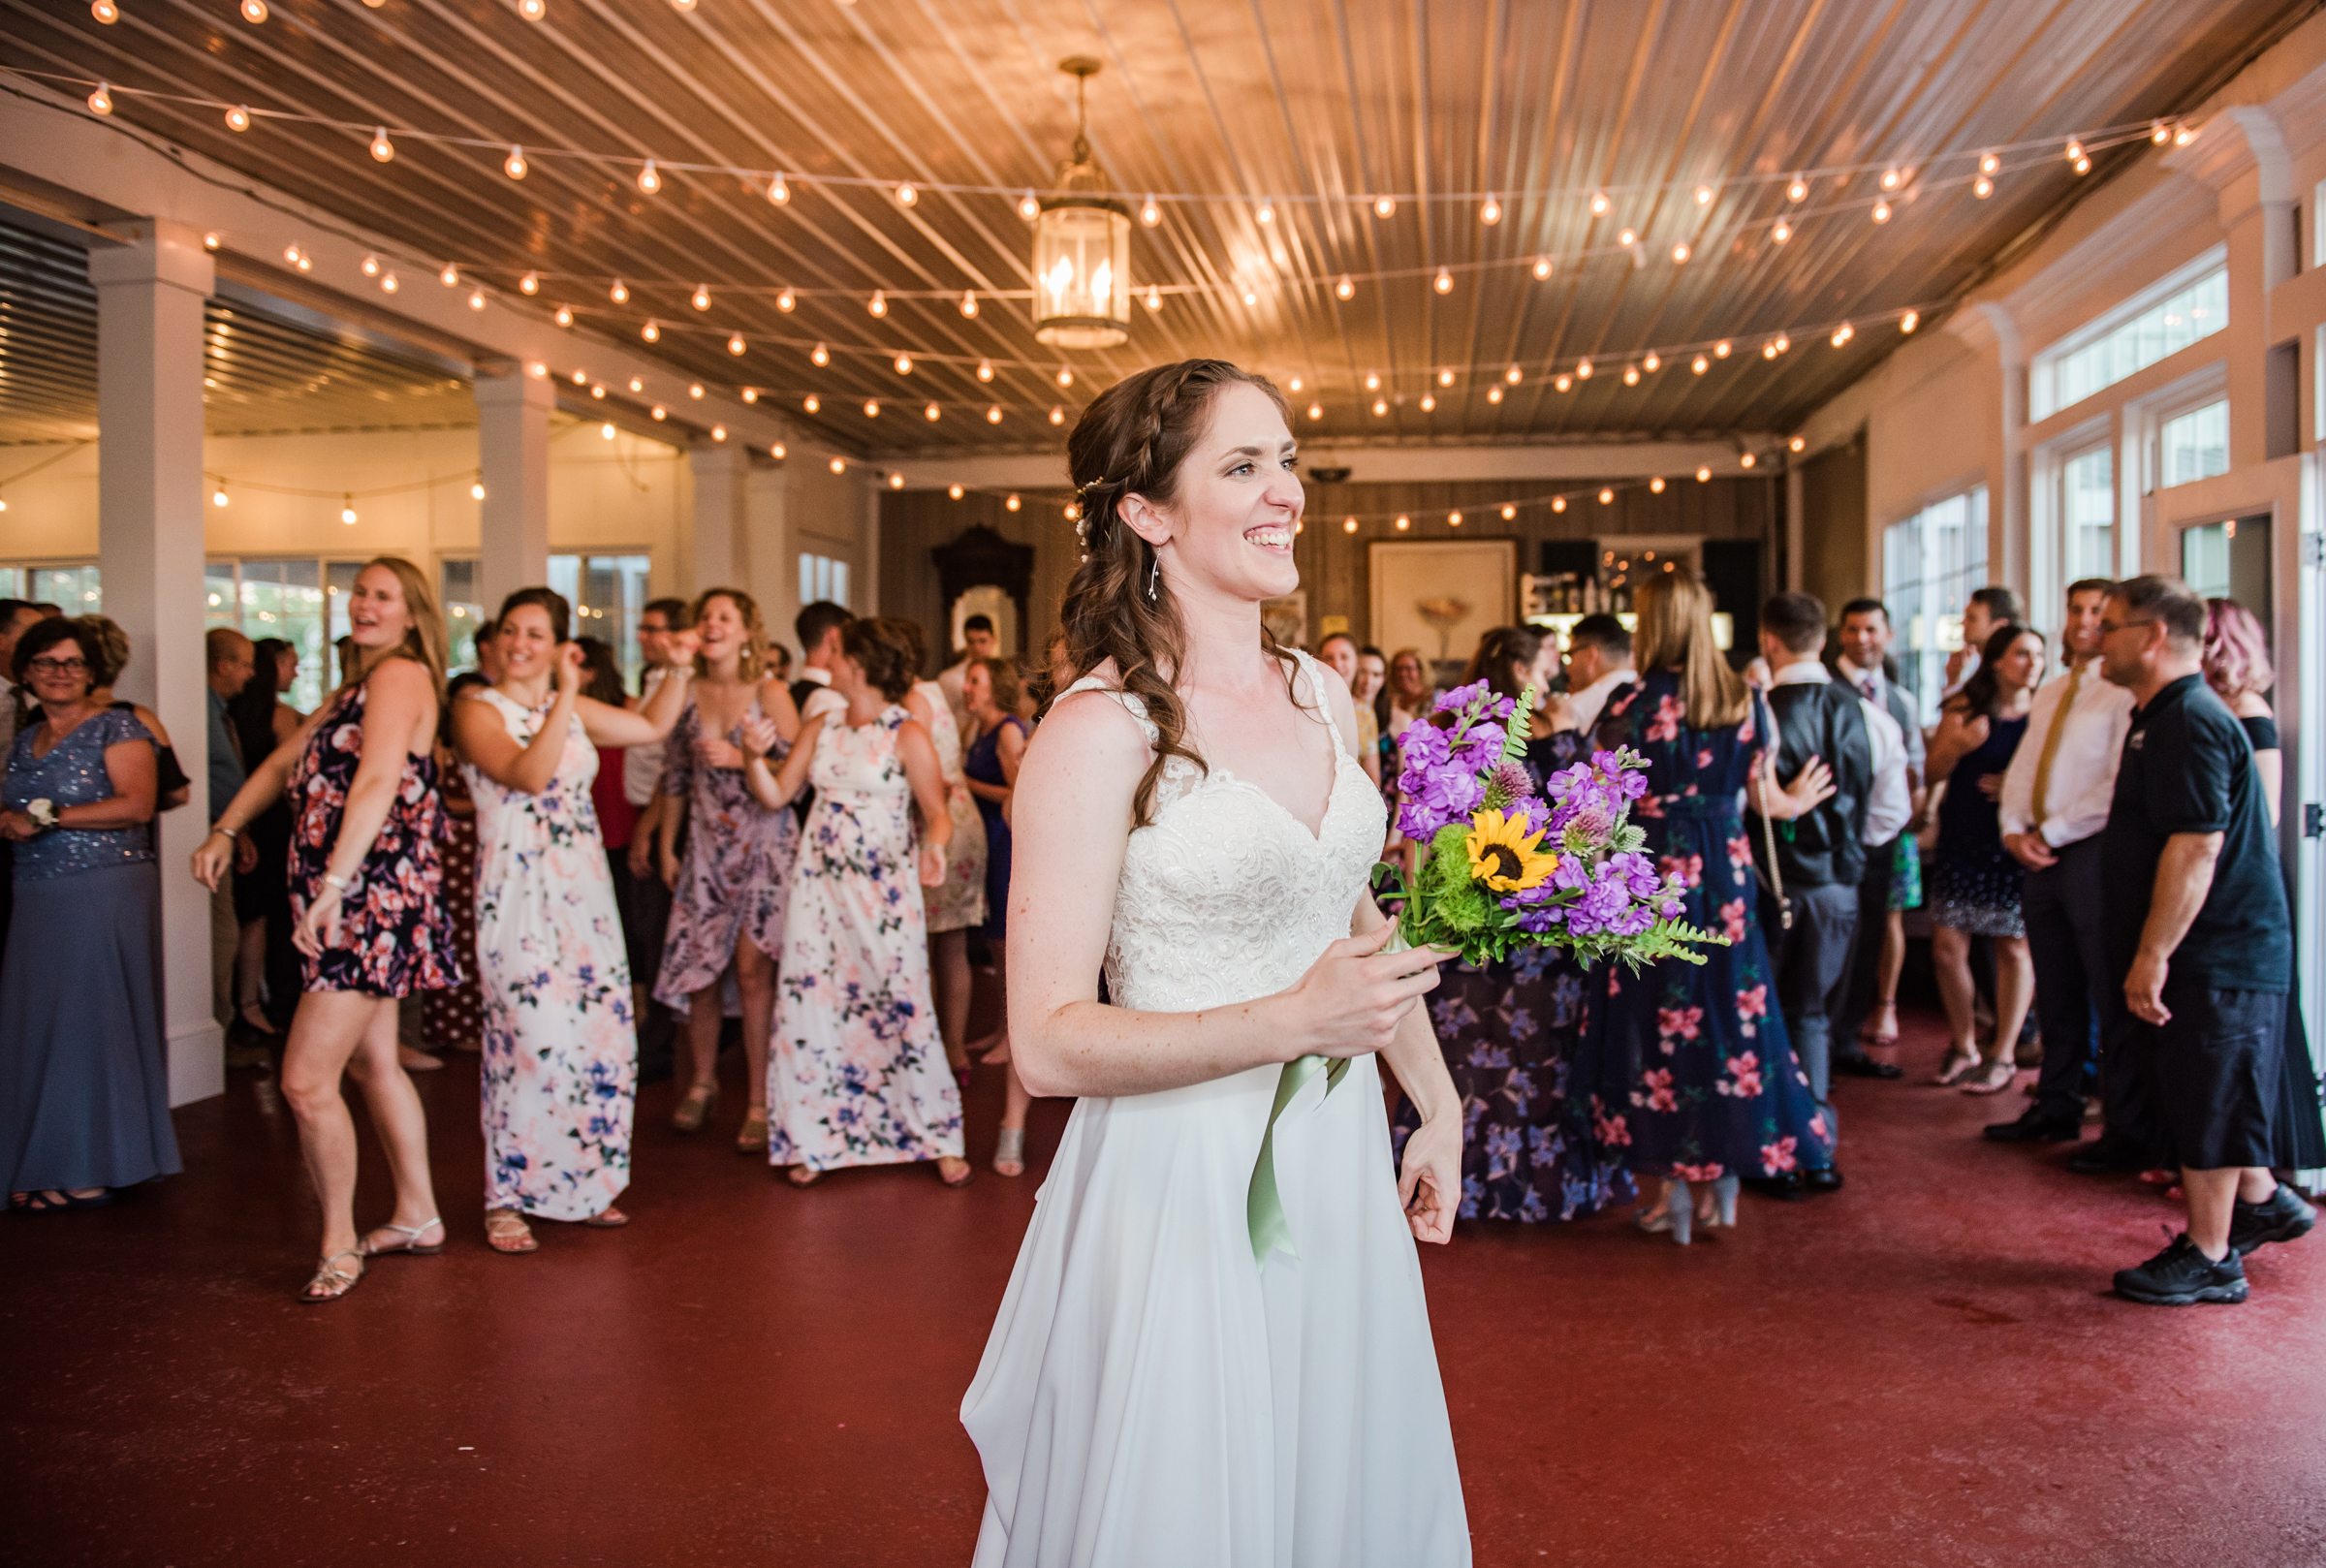 Jerris_Wadsworth_Wedding_Barn_Rochester_Wedding_JILL_STUDIO_Rochester_NY_Photographer_DSC_3055.jpg